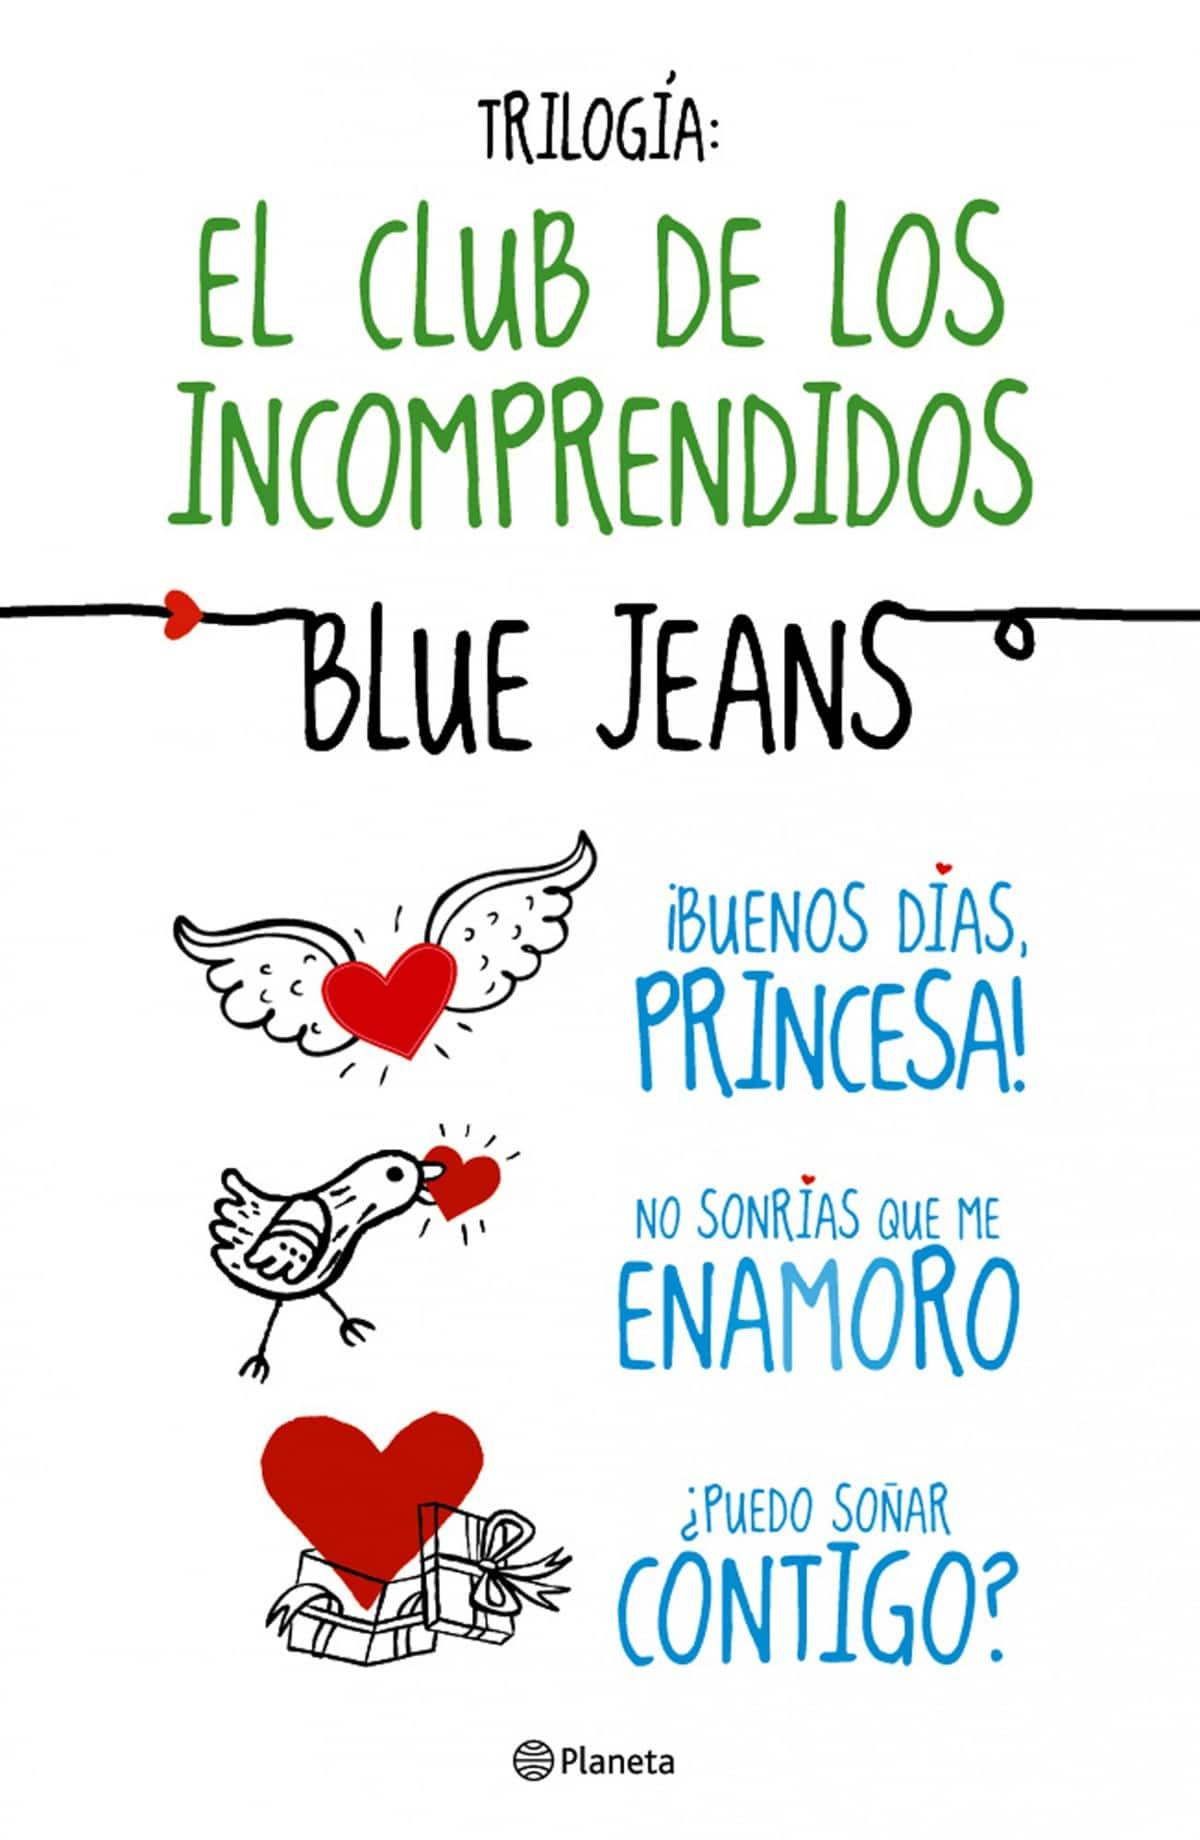 trilogia Blue Jeans